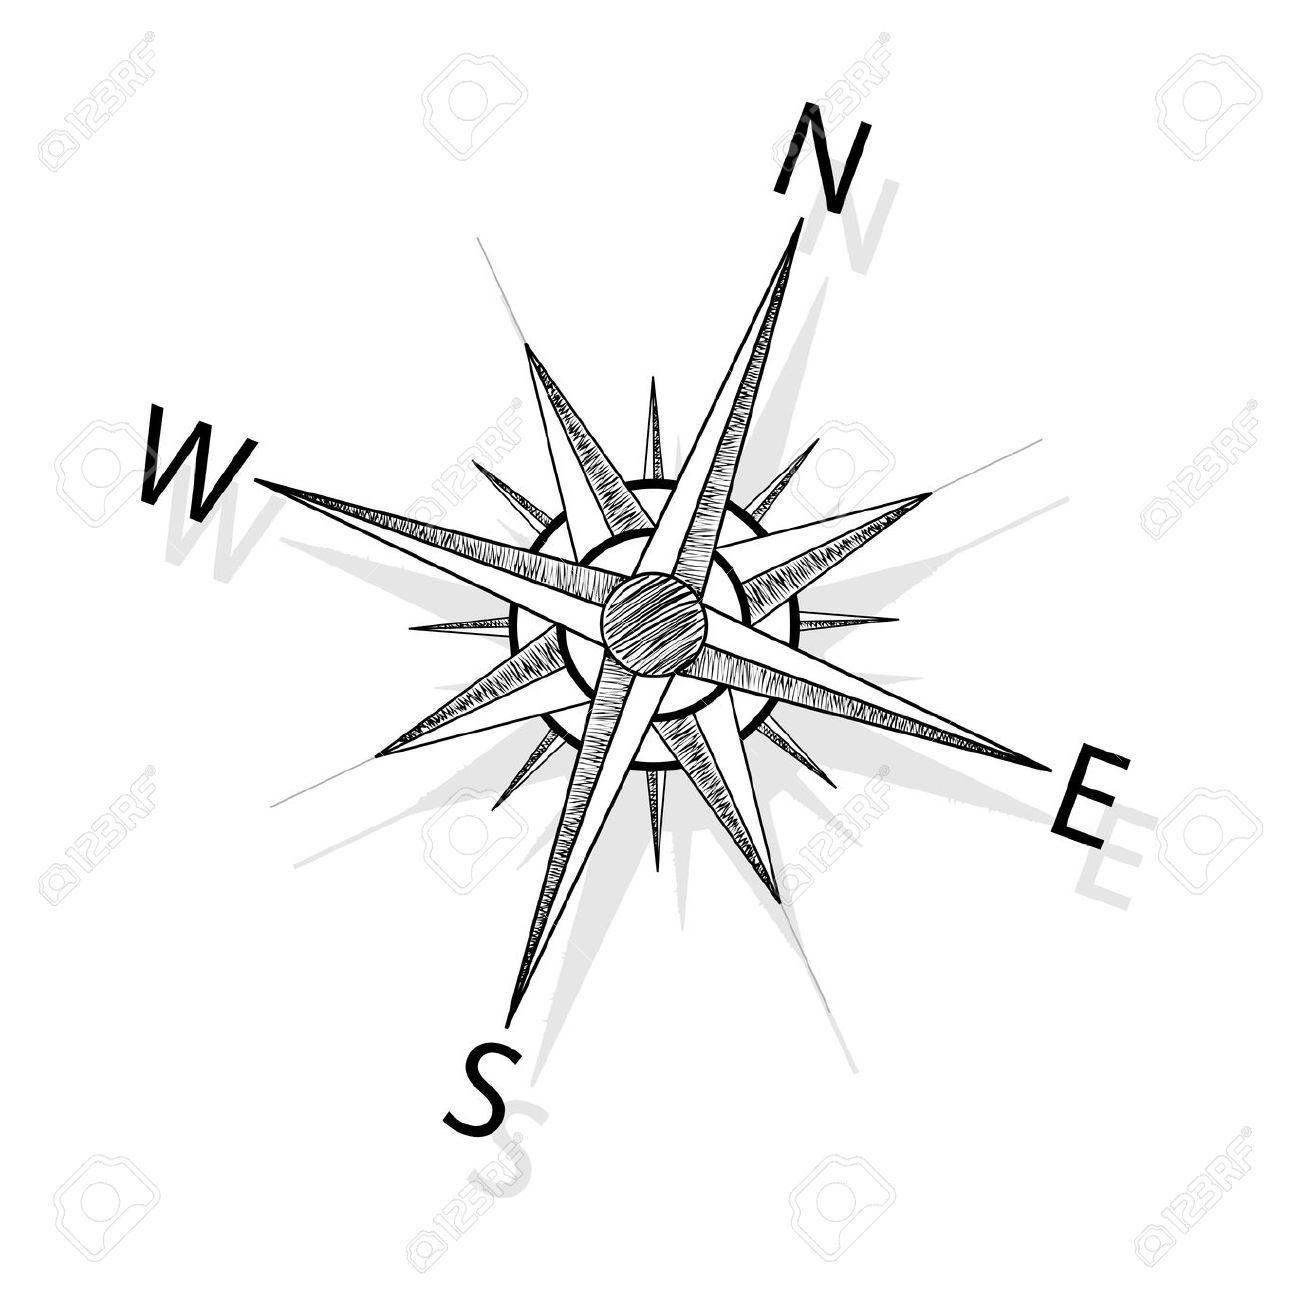 Images for compass rose drawing inspiration pinterest - Dessin de rose ...